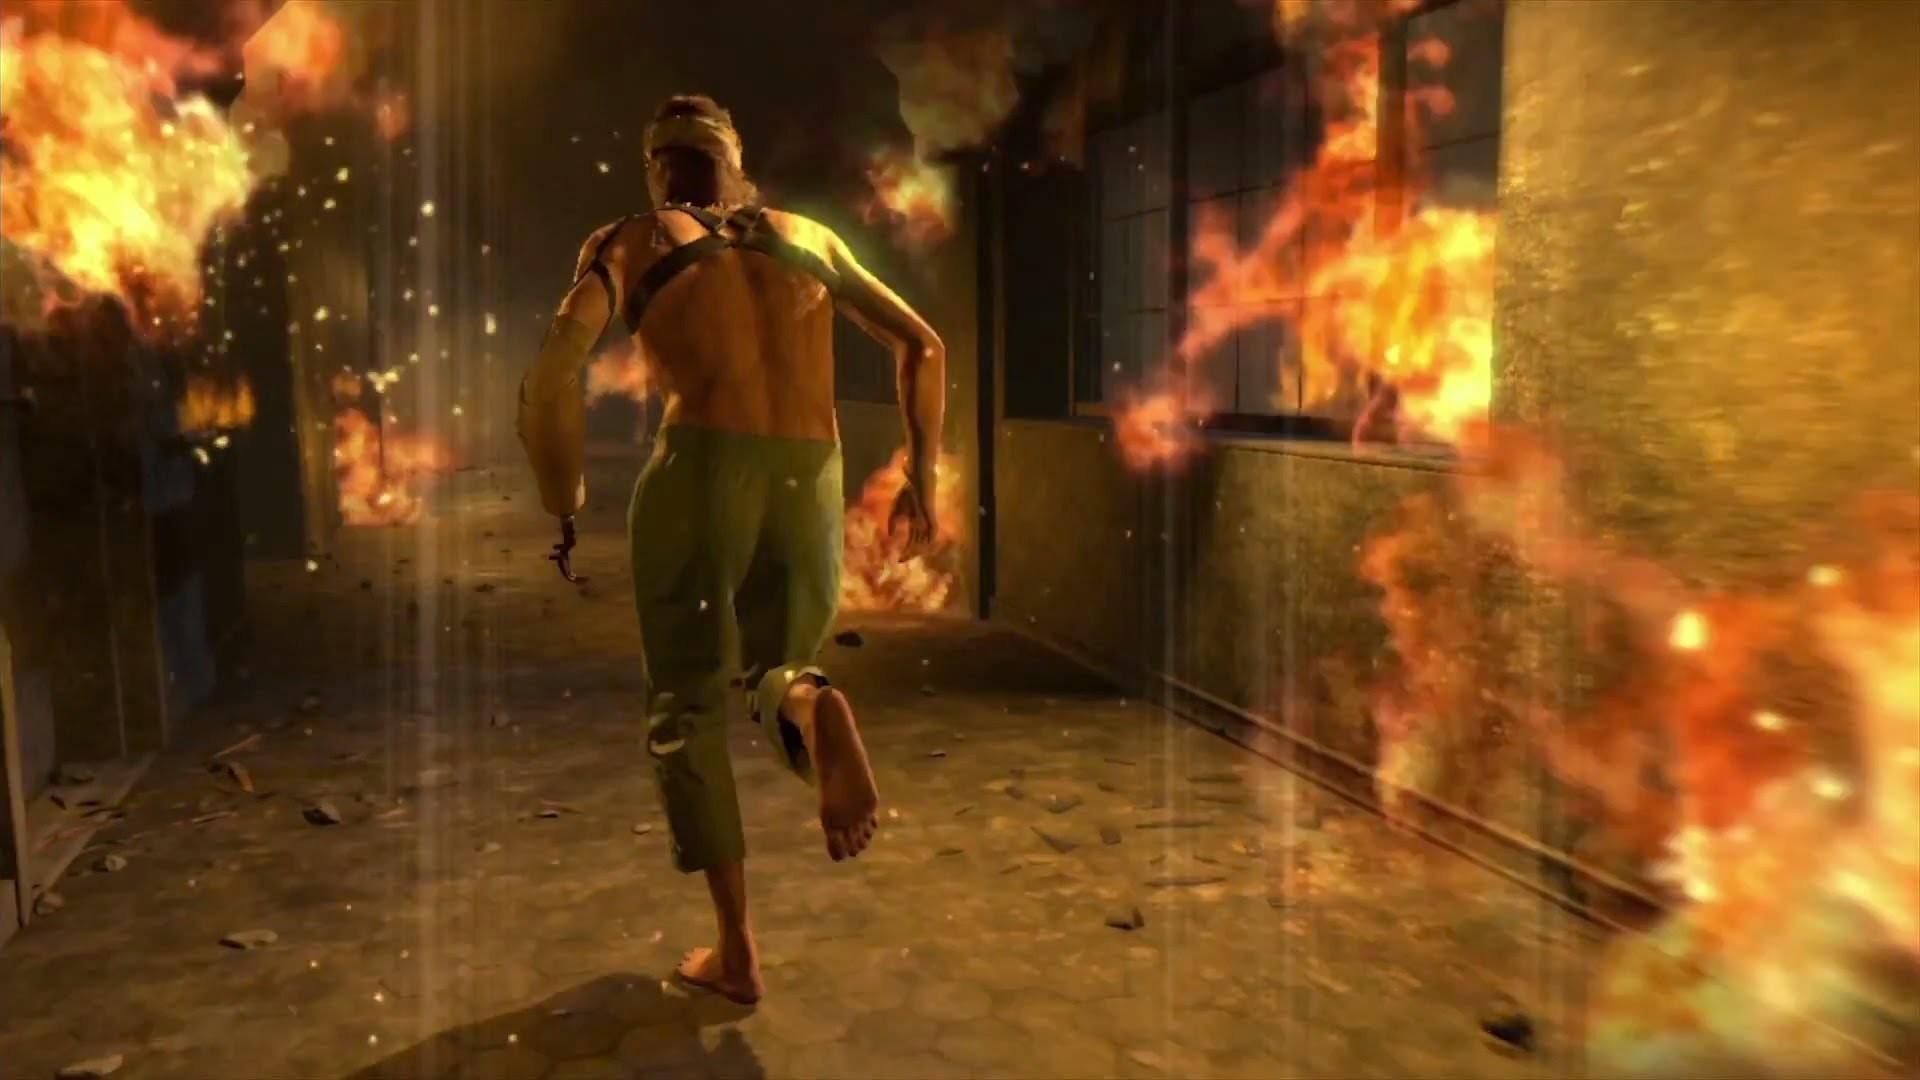 The Phantom Pain (Metal Gear Solid 5) 'Debut Trailer' [1080p] TRUE-HD  QUALITY – YouTube